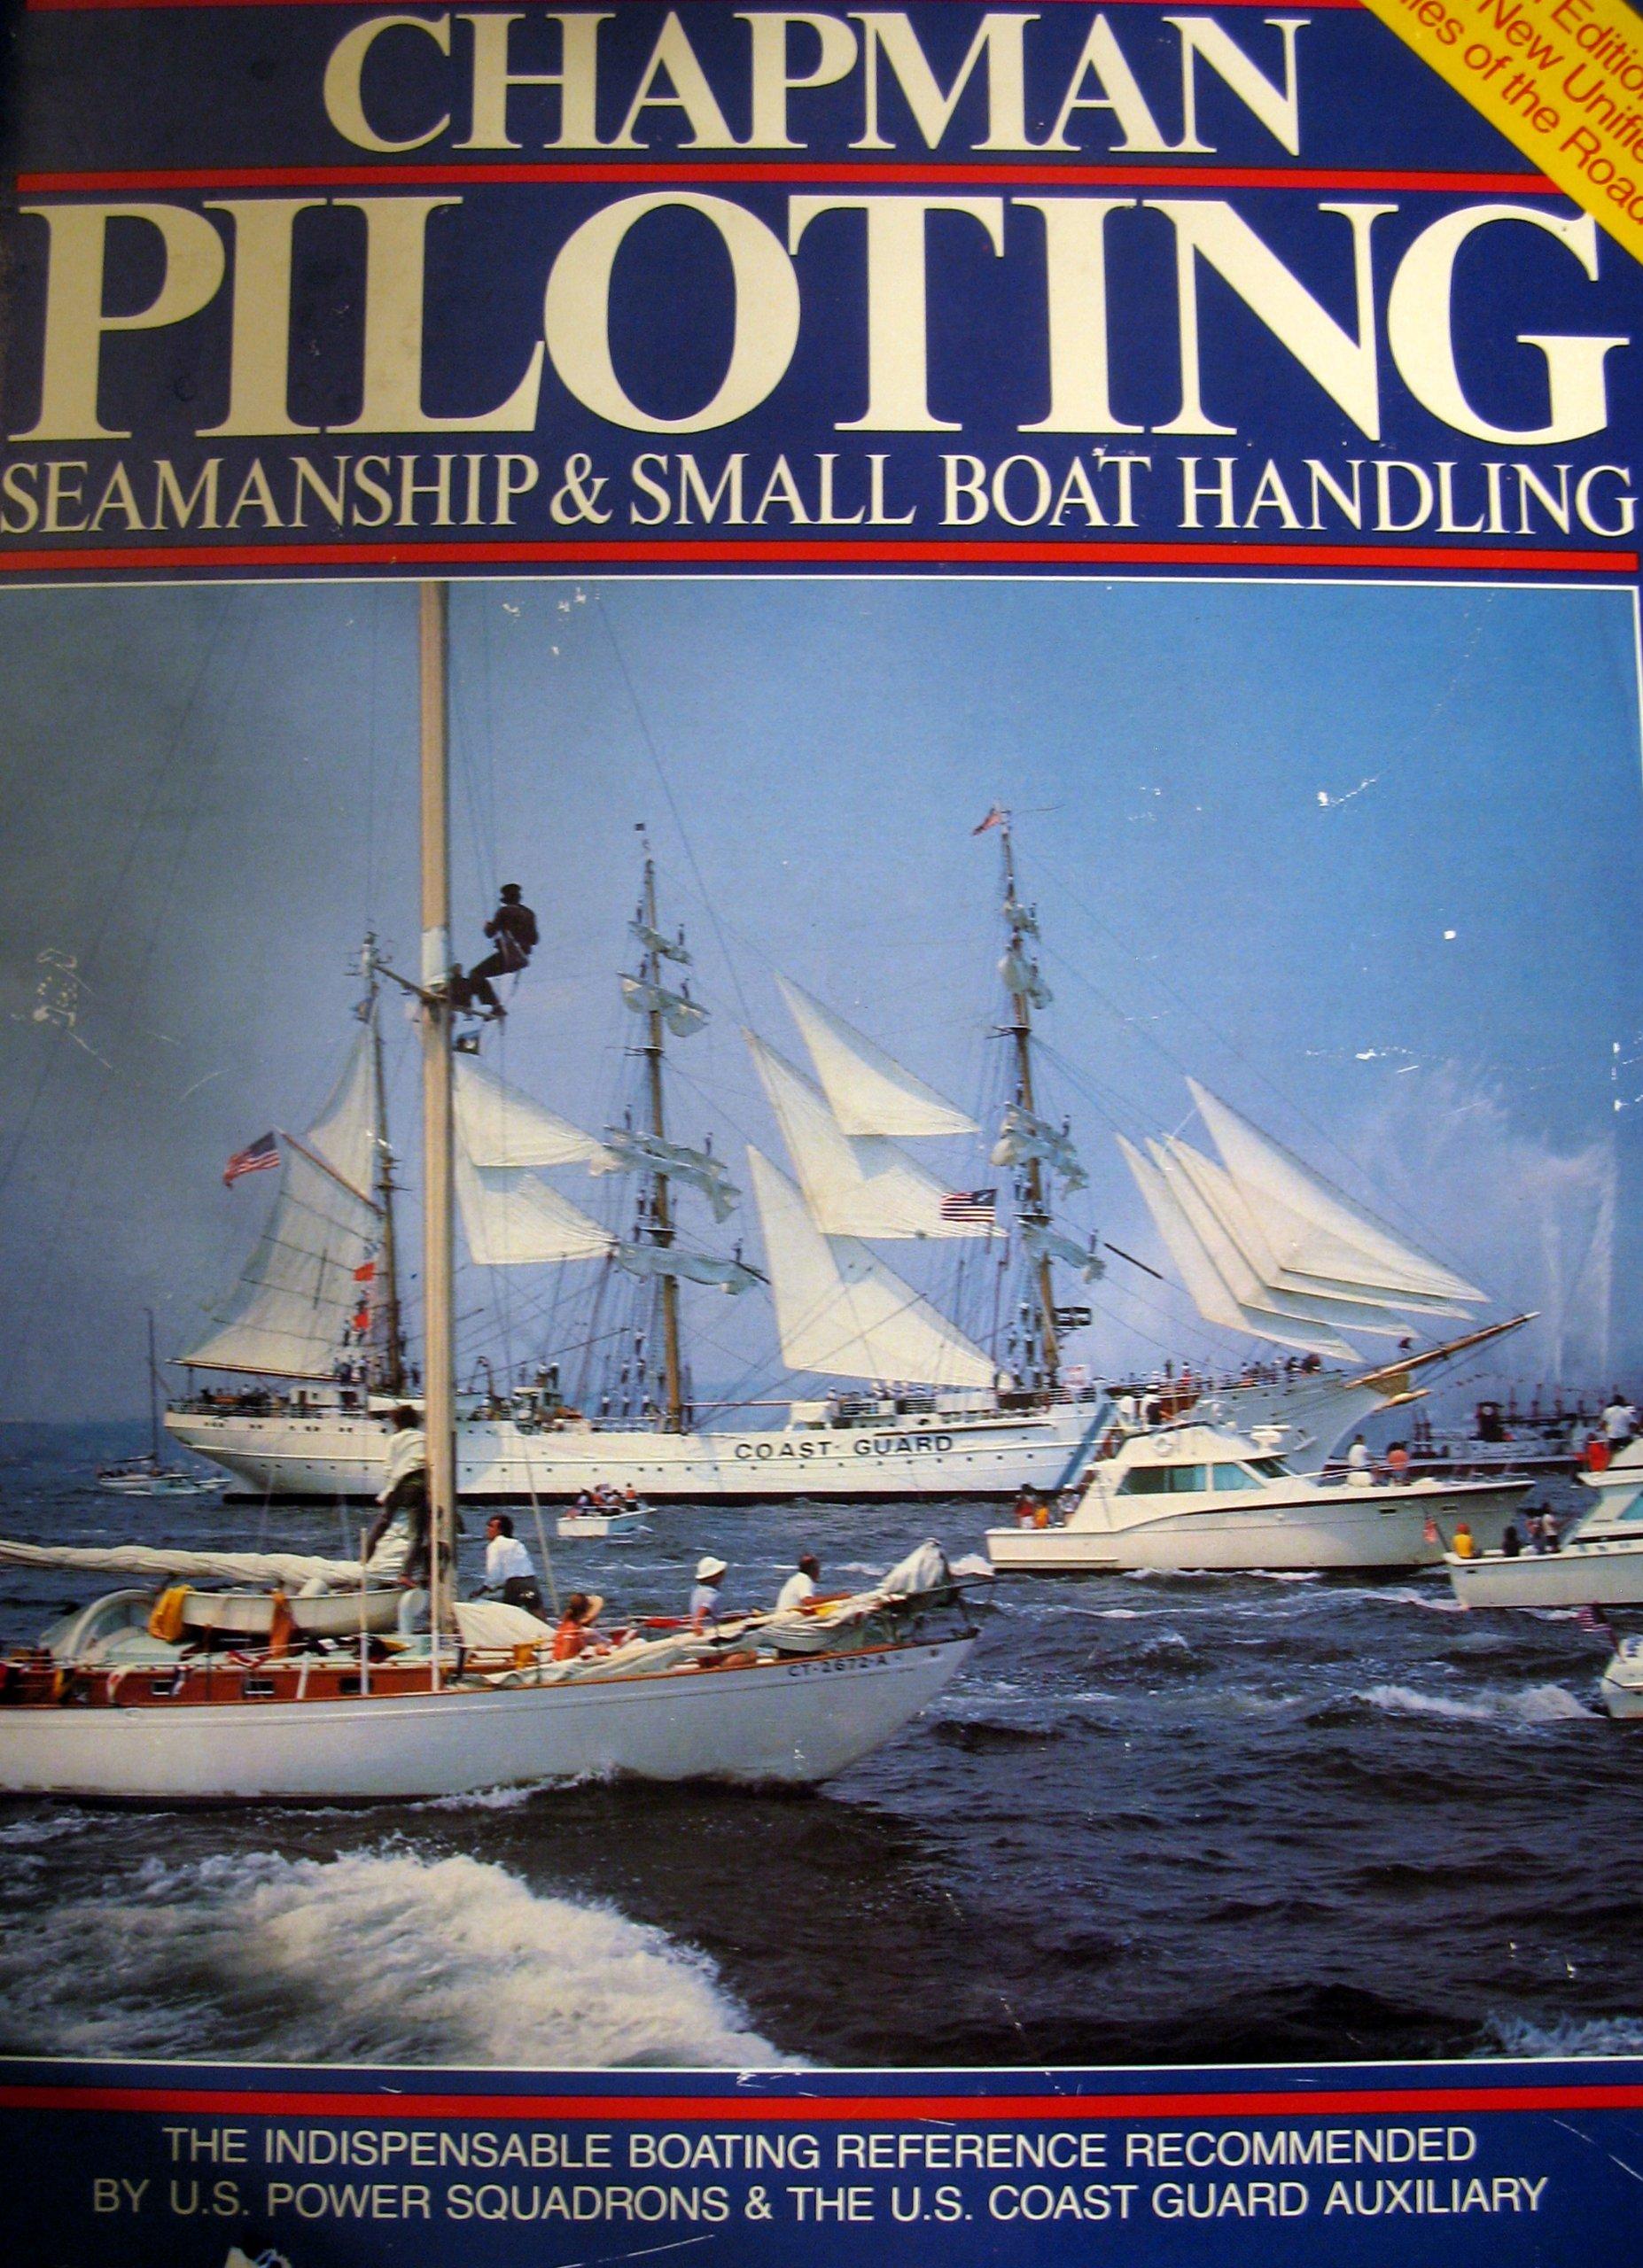 55th-edition-chapman-piloting-seamanship-and-small-boat-handling